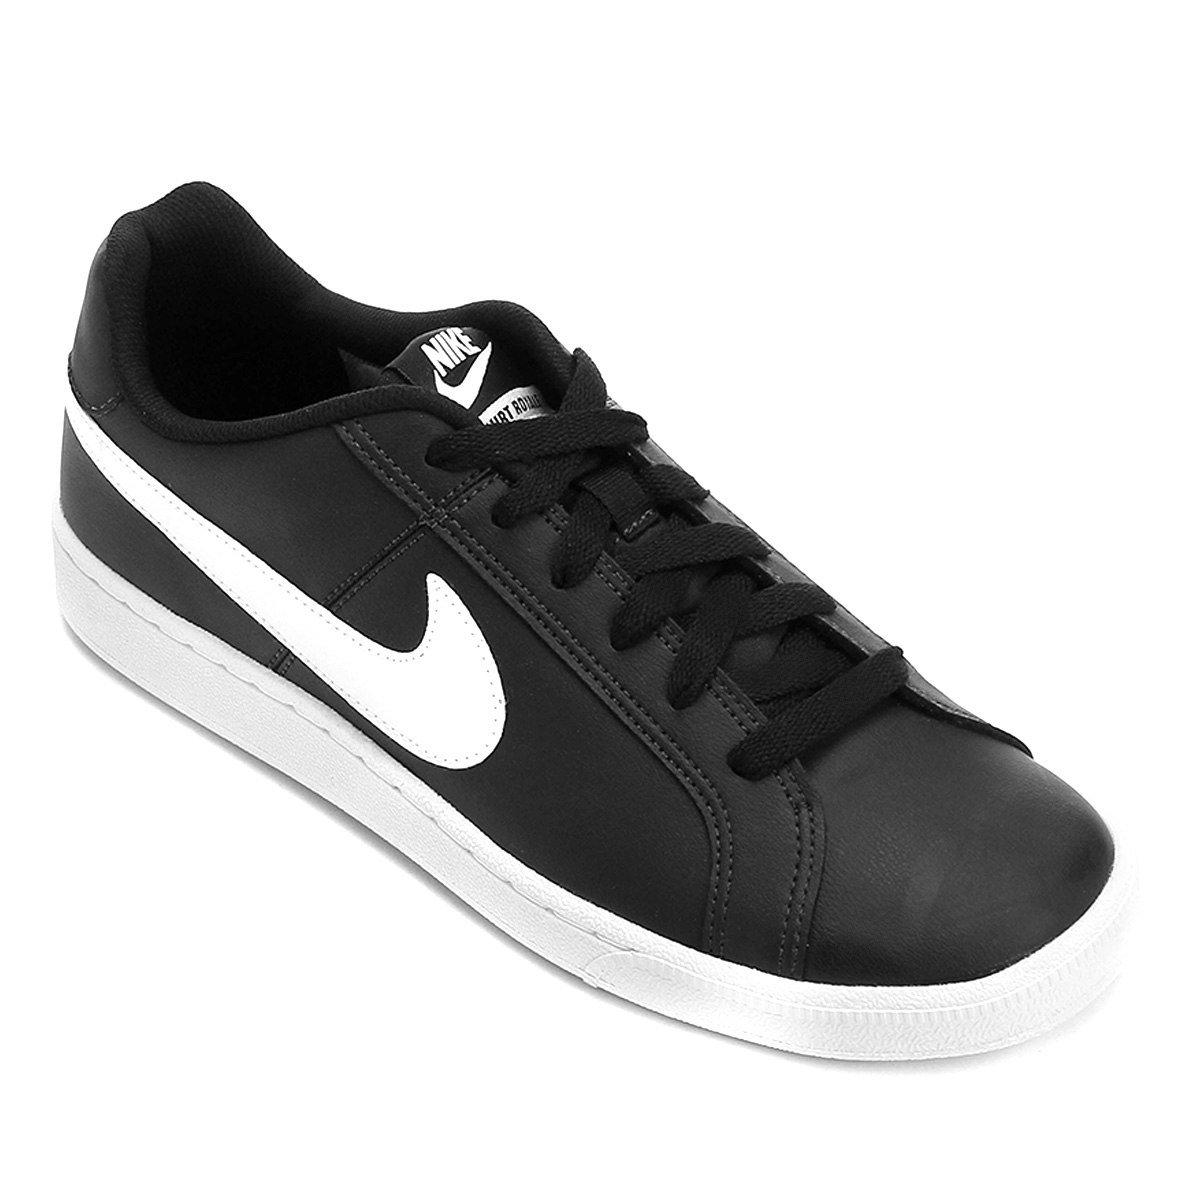 73a9e7e21 Tênis Nike Court Royale Casual Masculino - Decker Online!